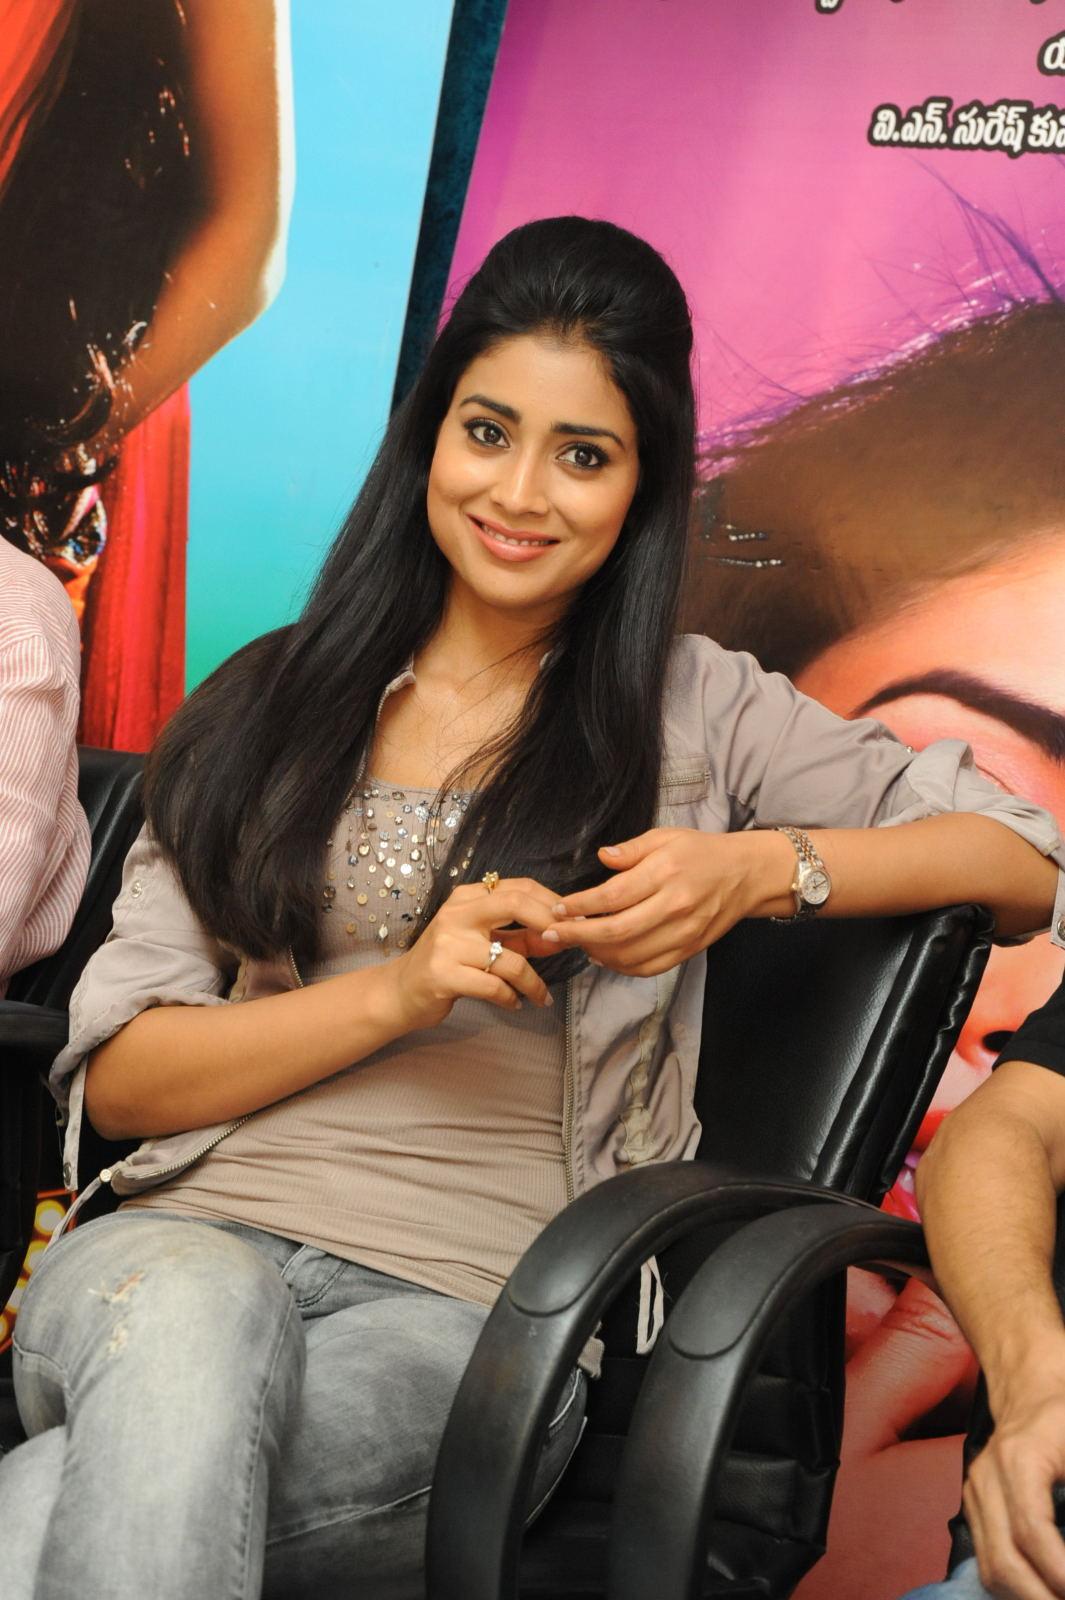 Sparkling Shriya gorgeous looking photos at pavitra press meet